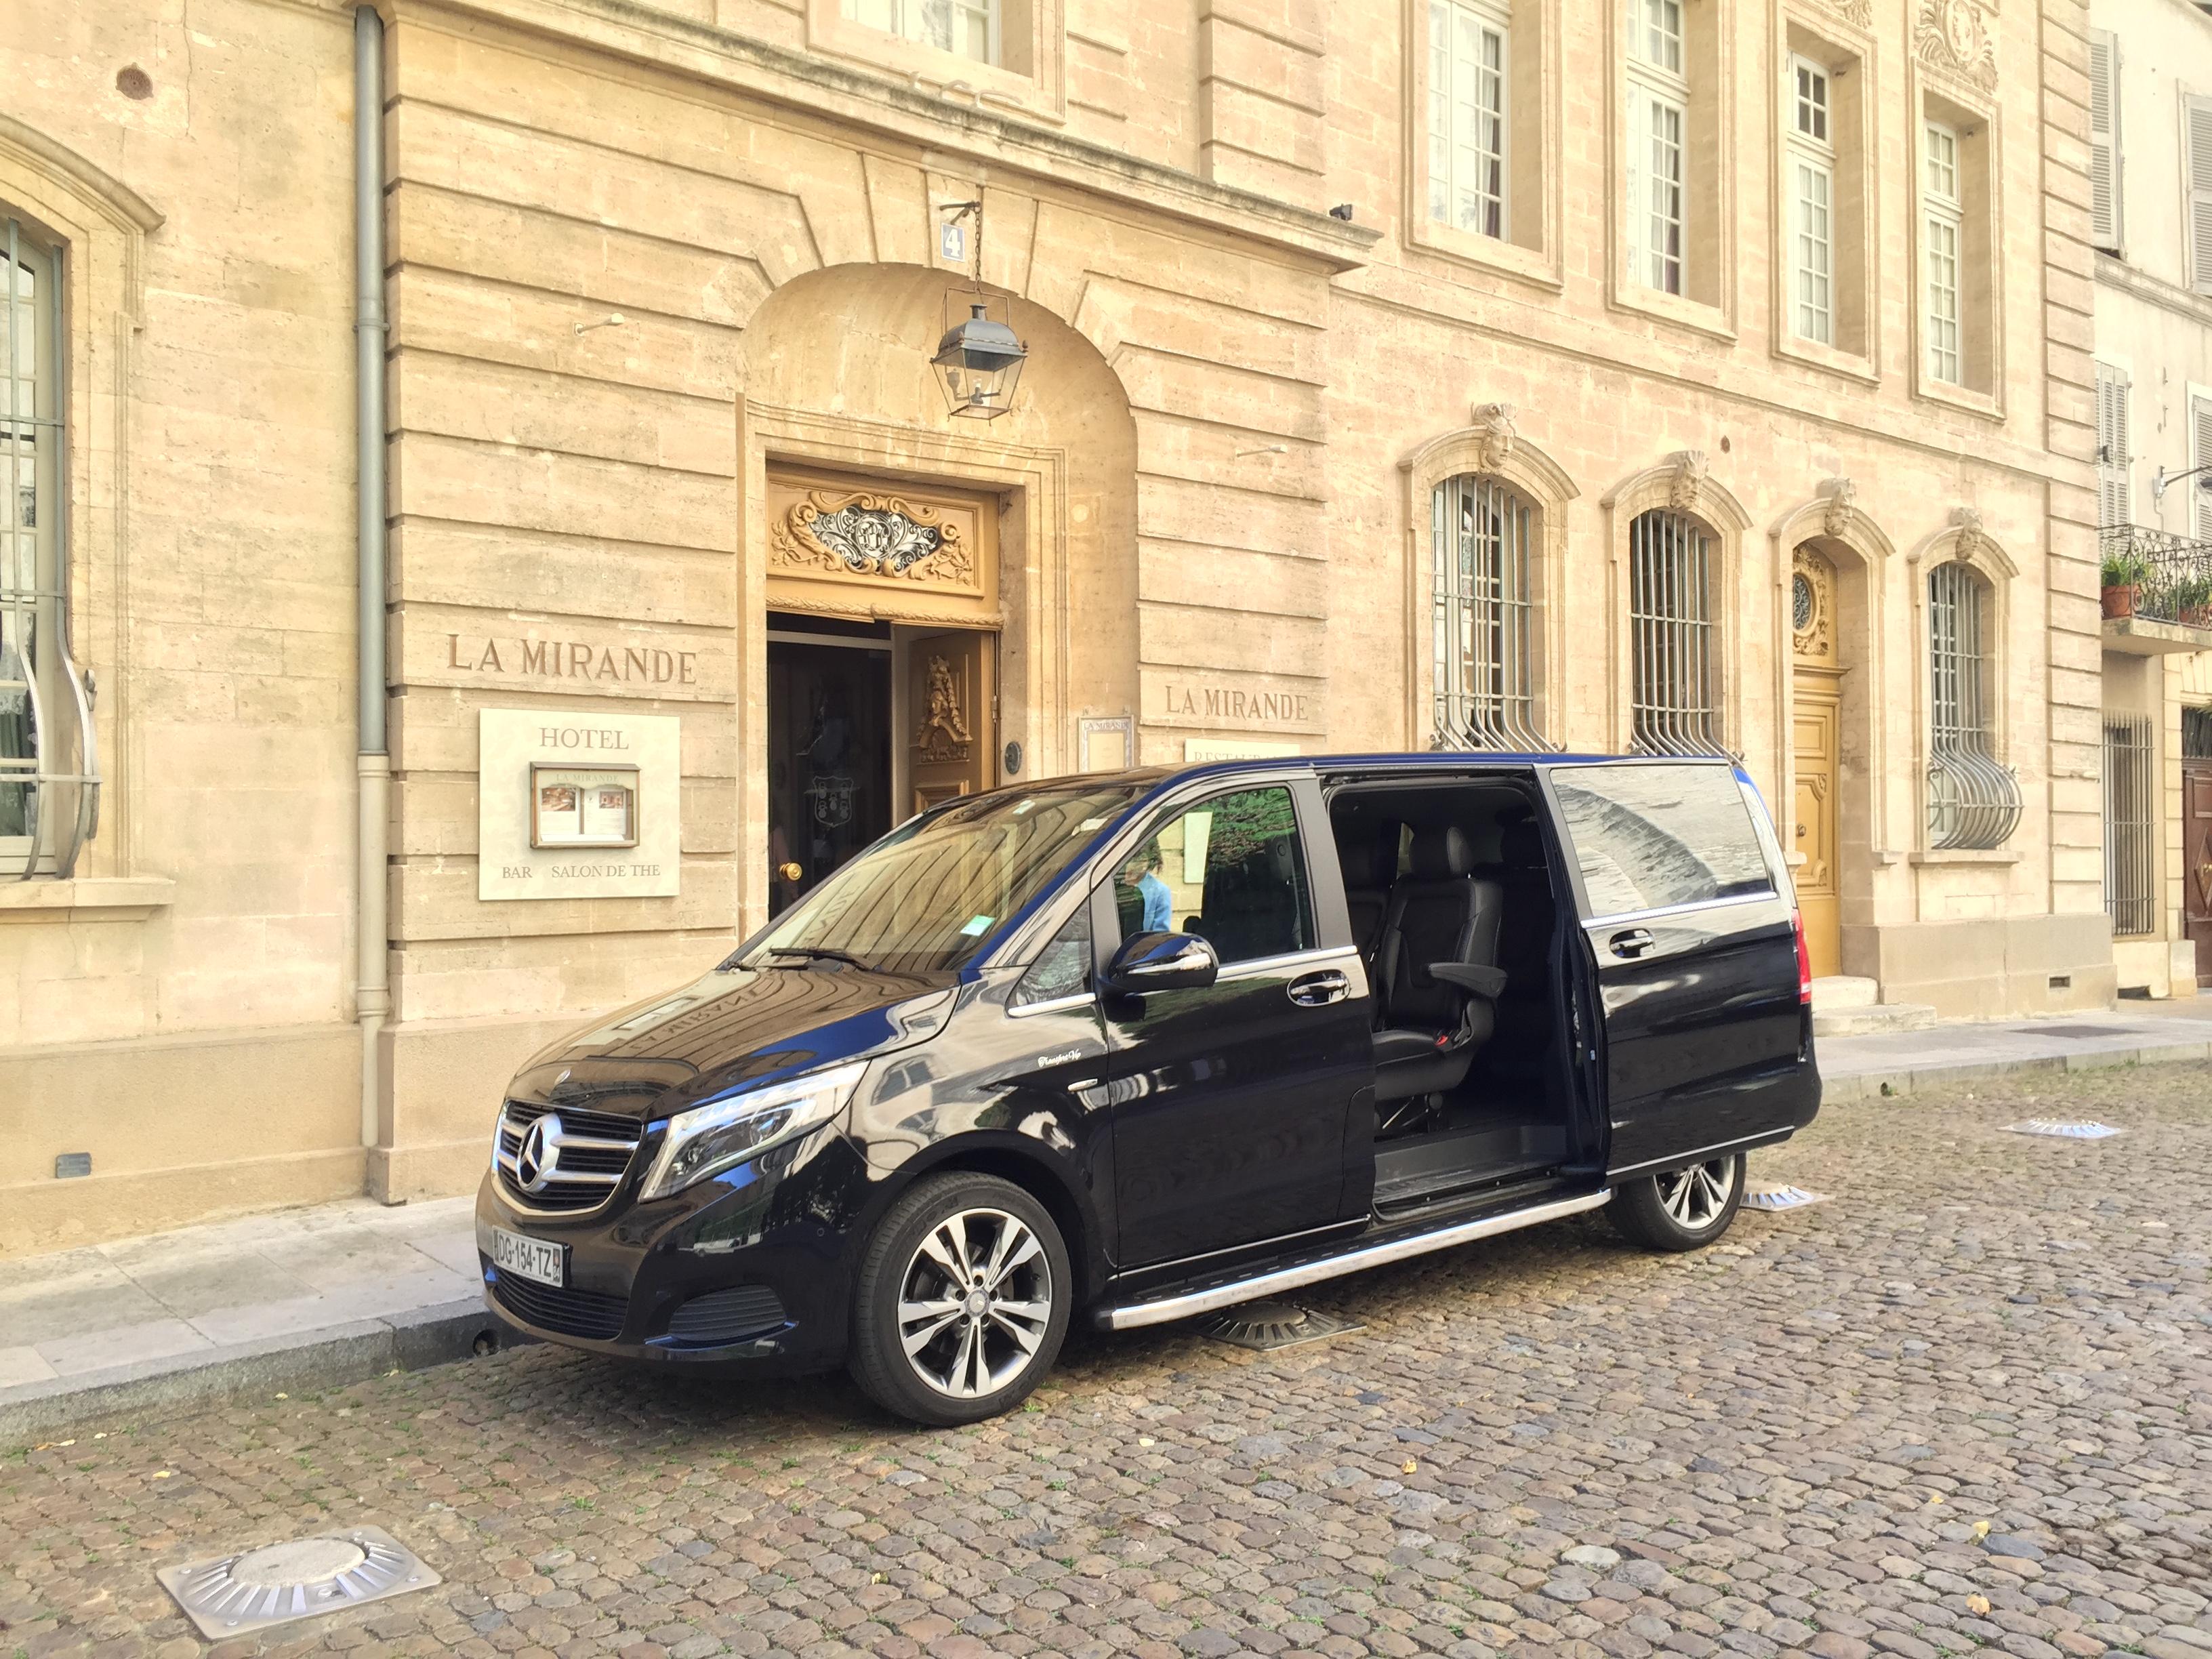 voiture avec chauffeur à Nîmes